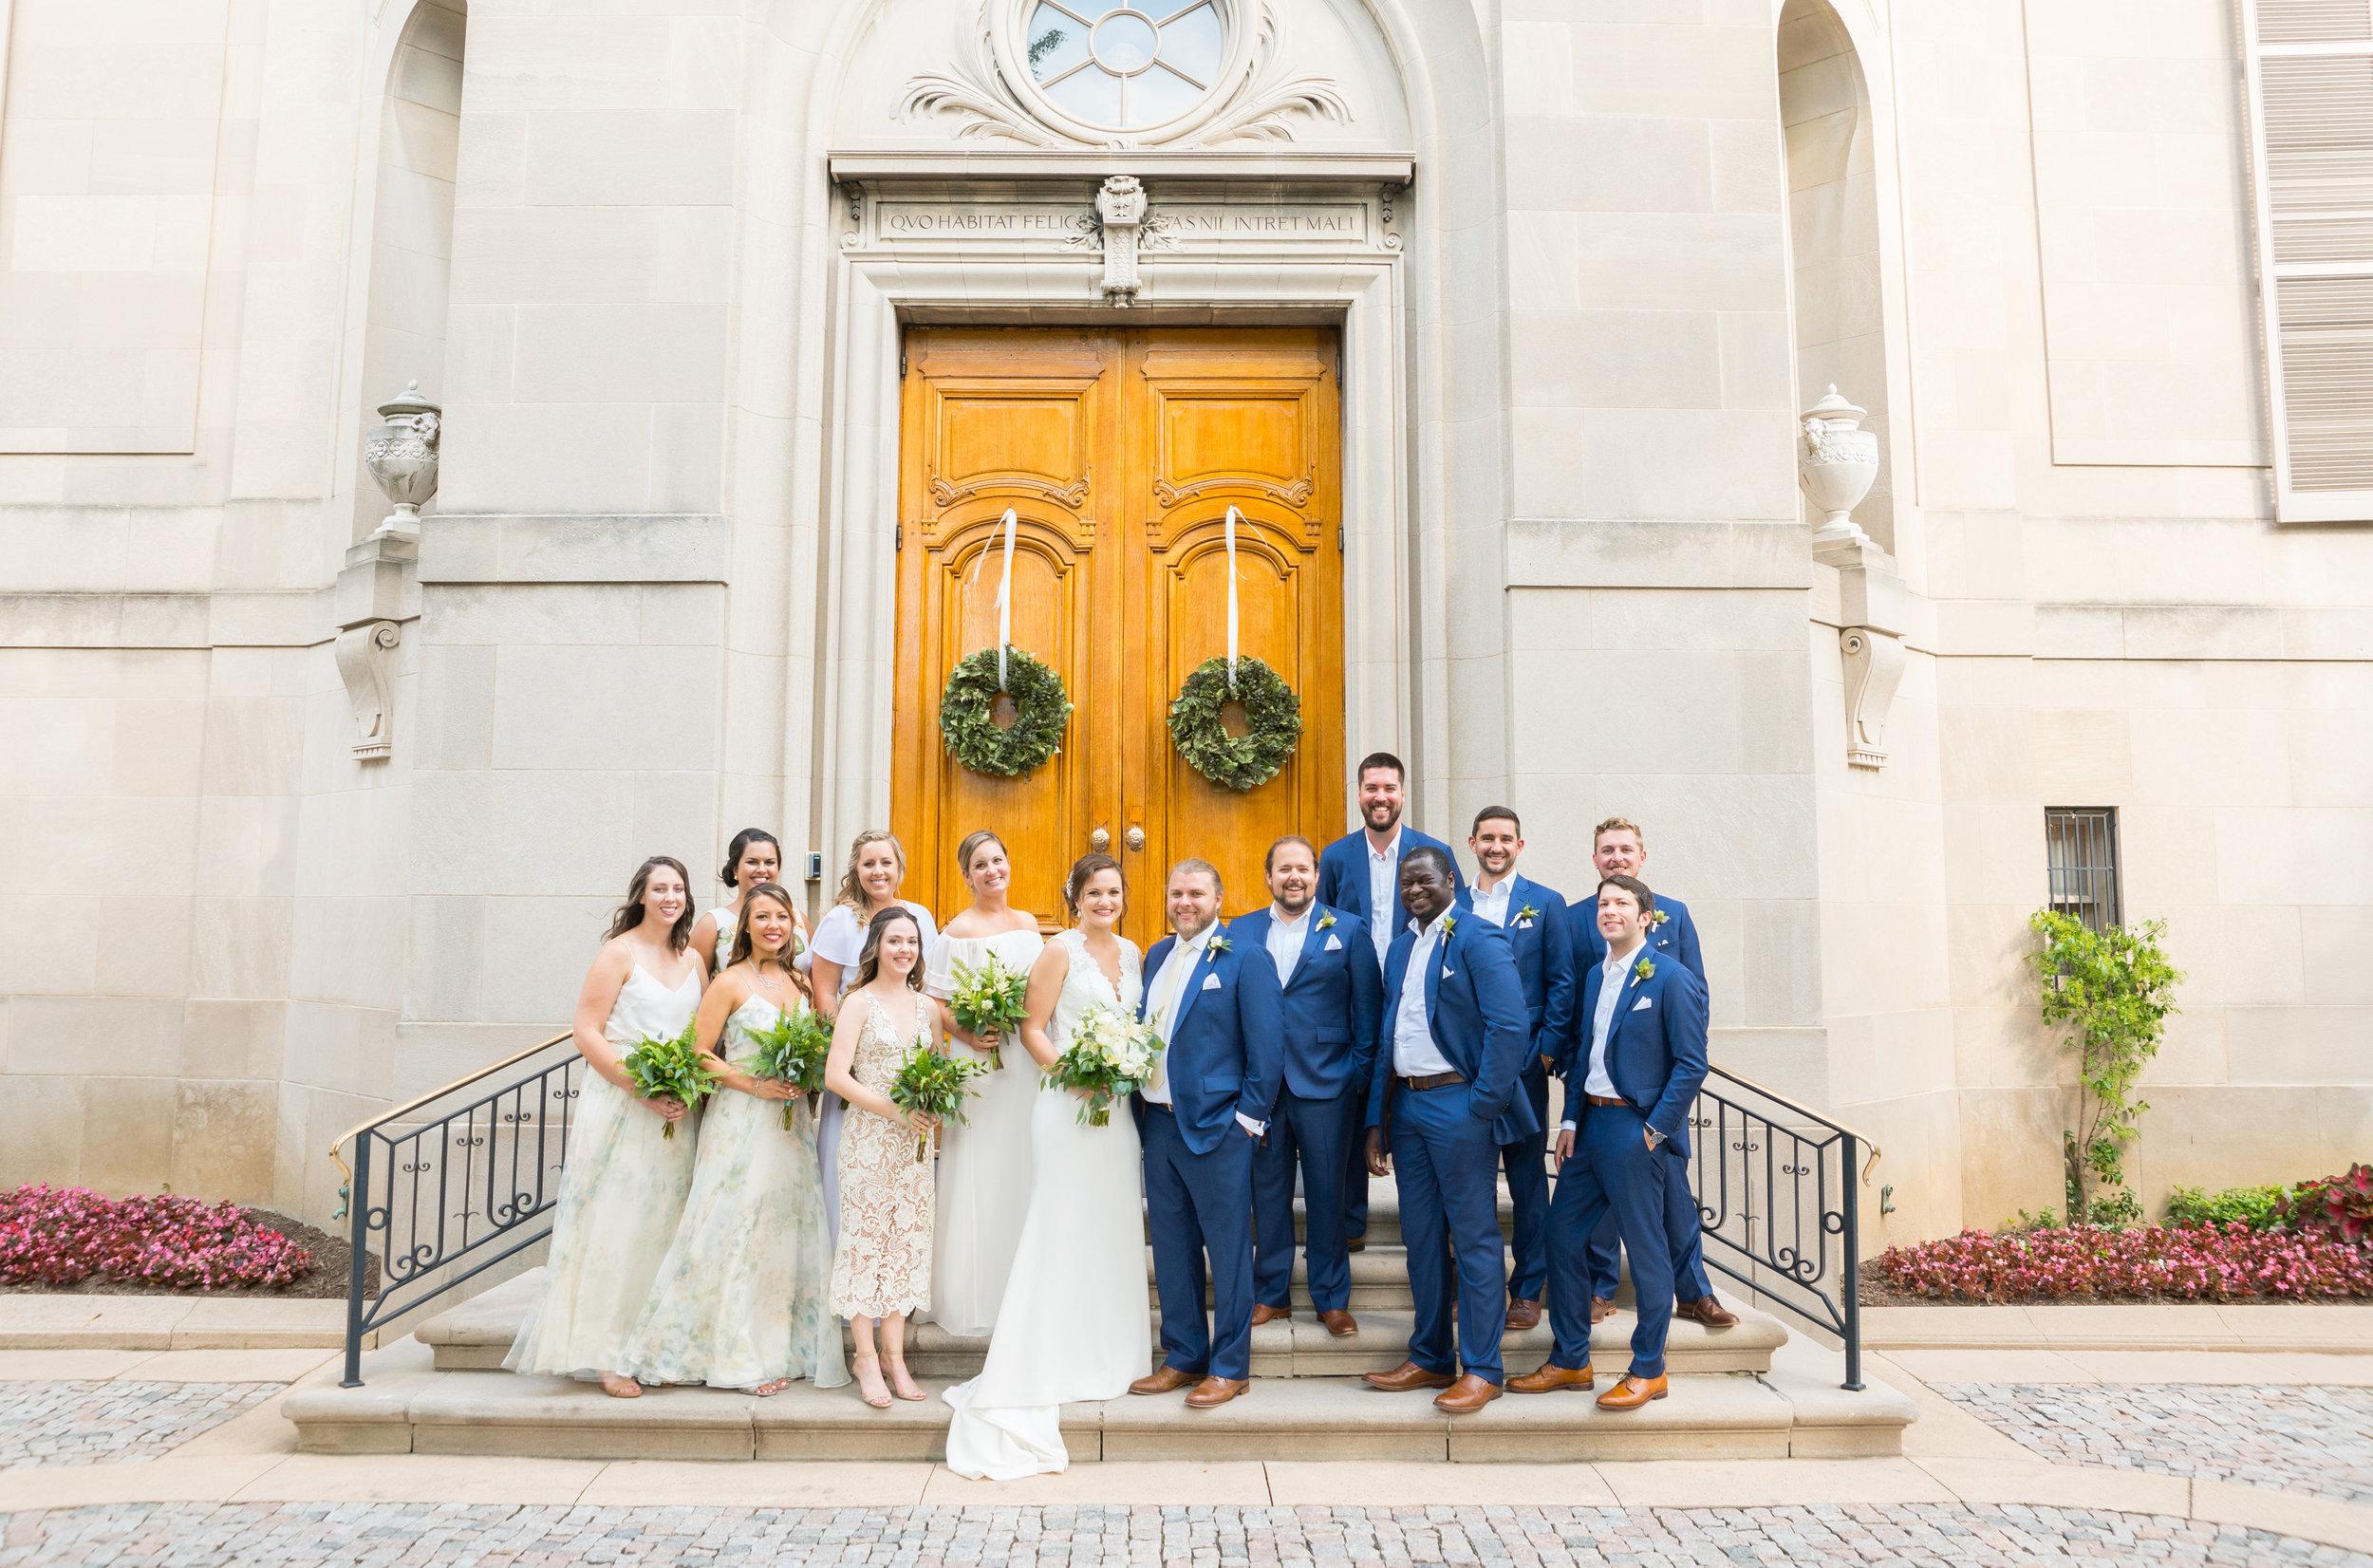 Meridian House front door wedding photos by jessica nazarova